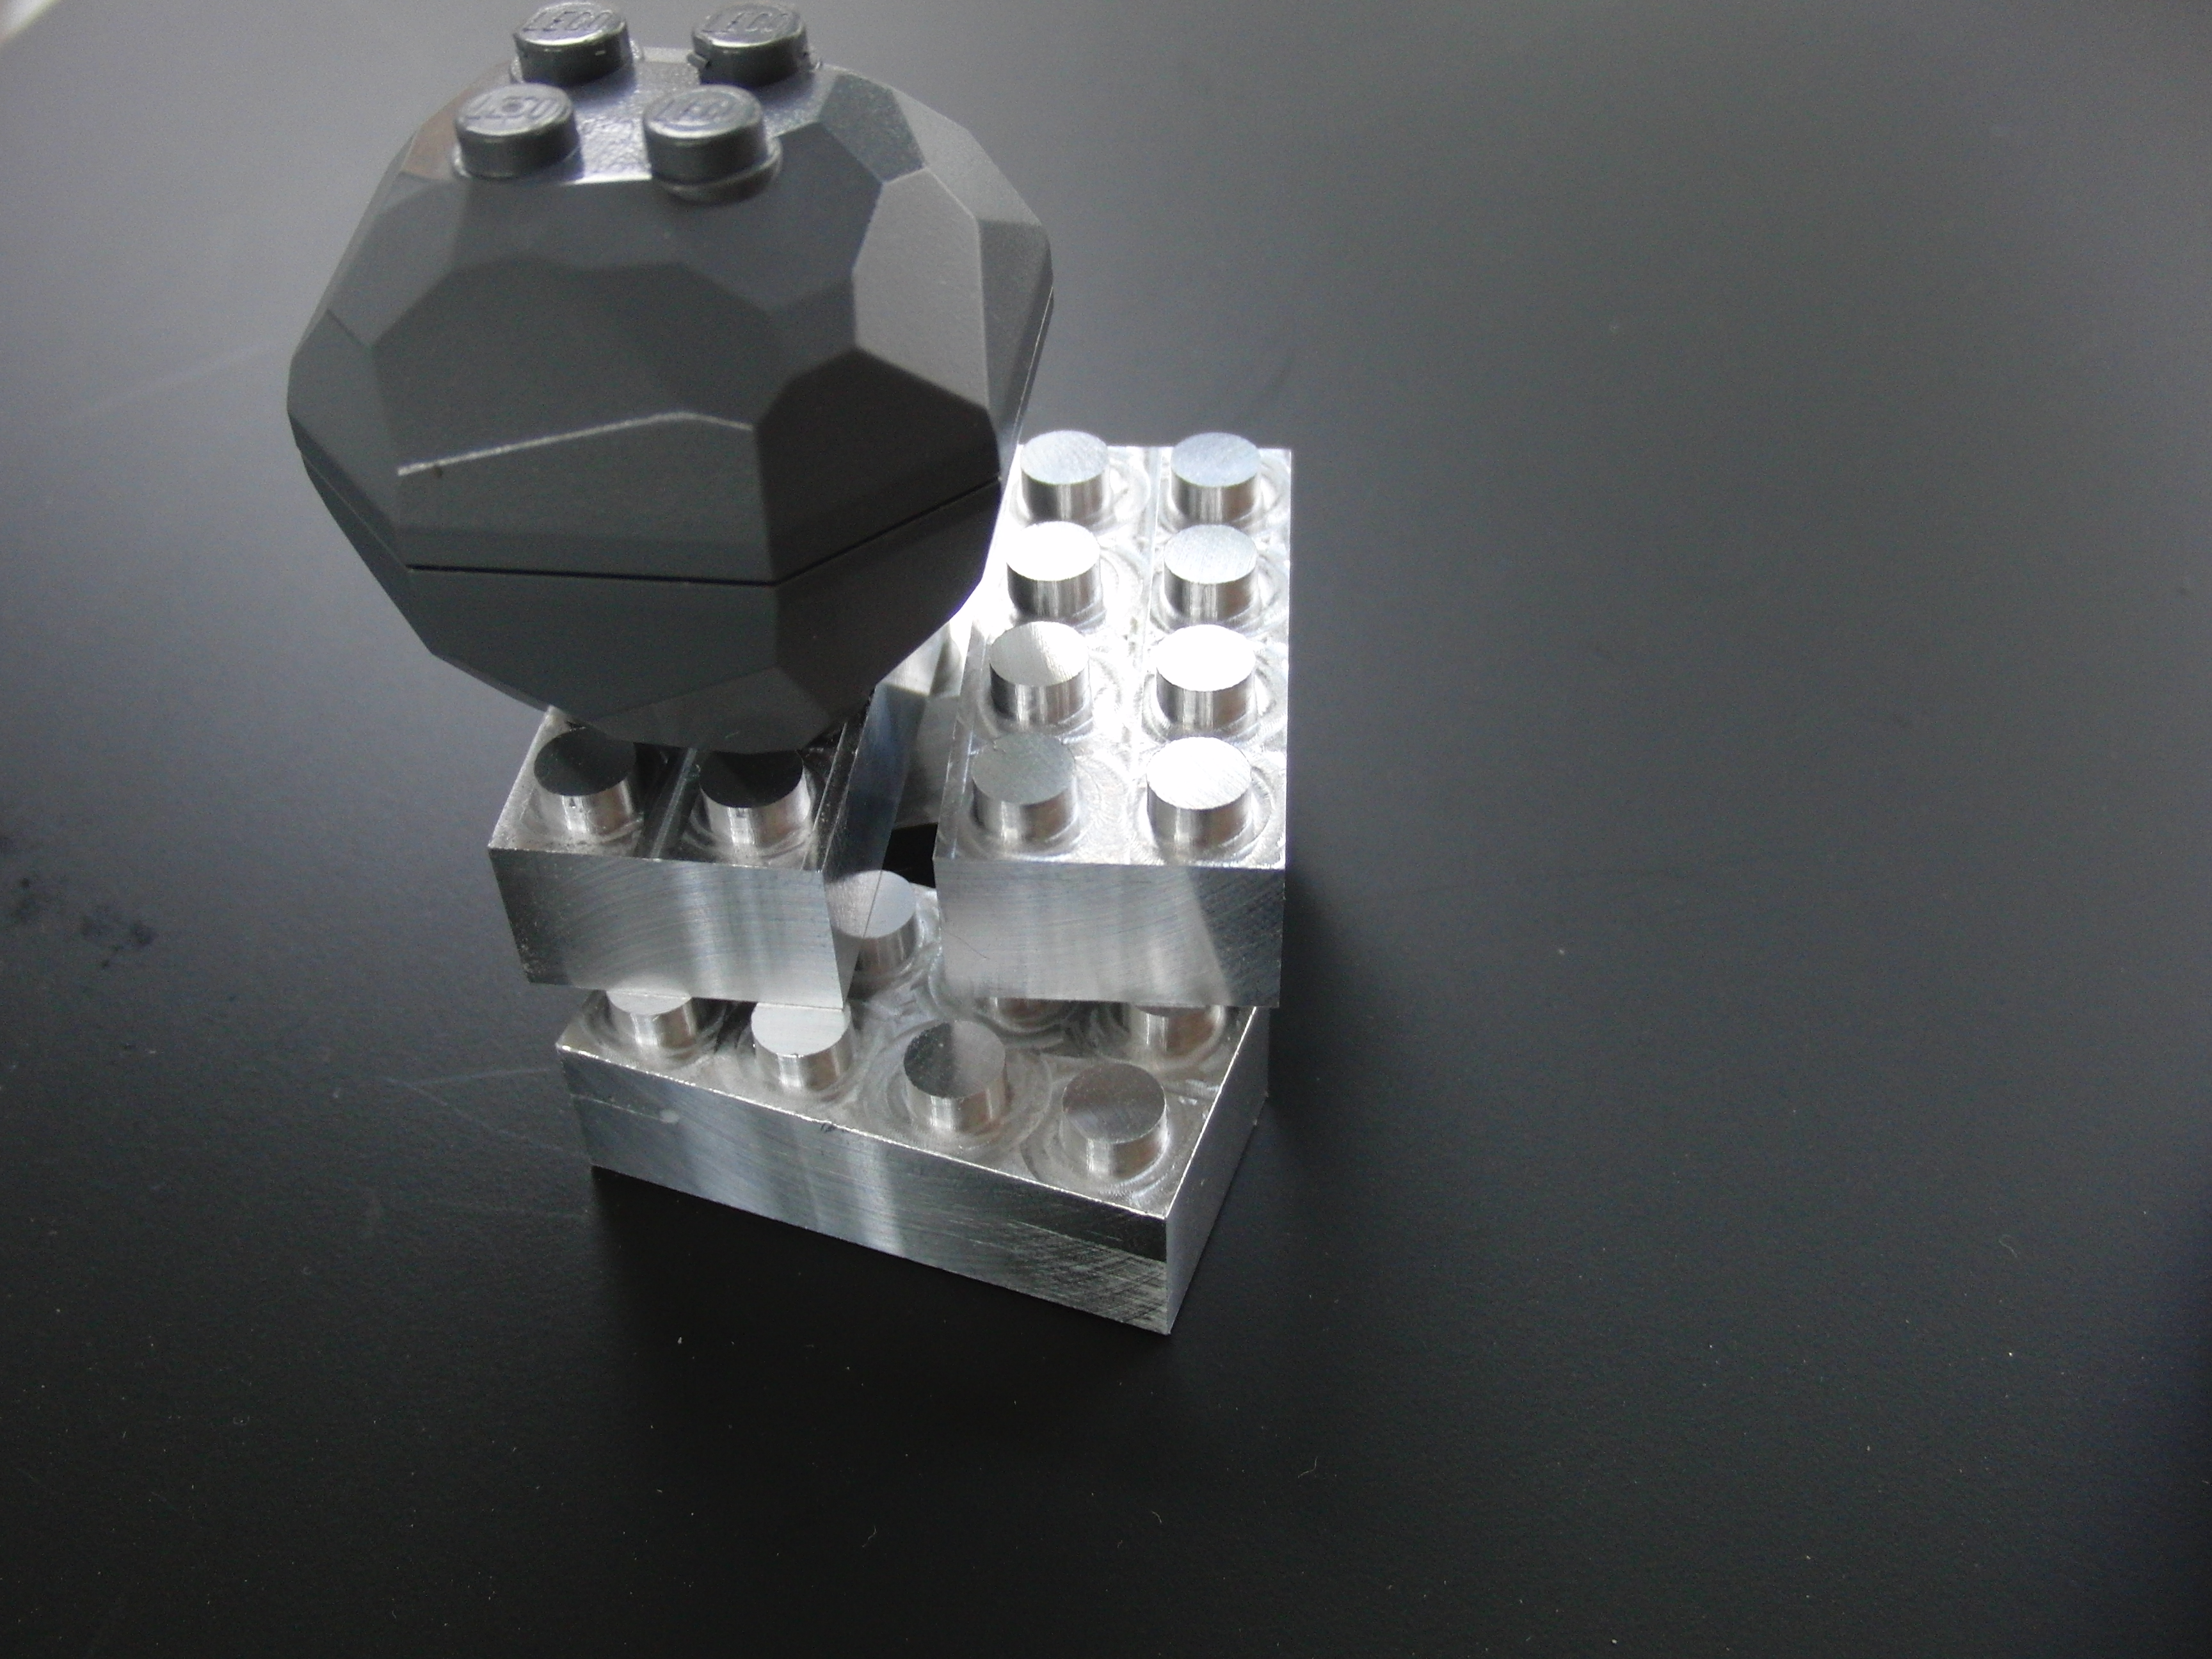 DIY AlUMINUM LEGO BLOCKS